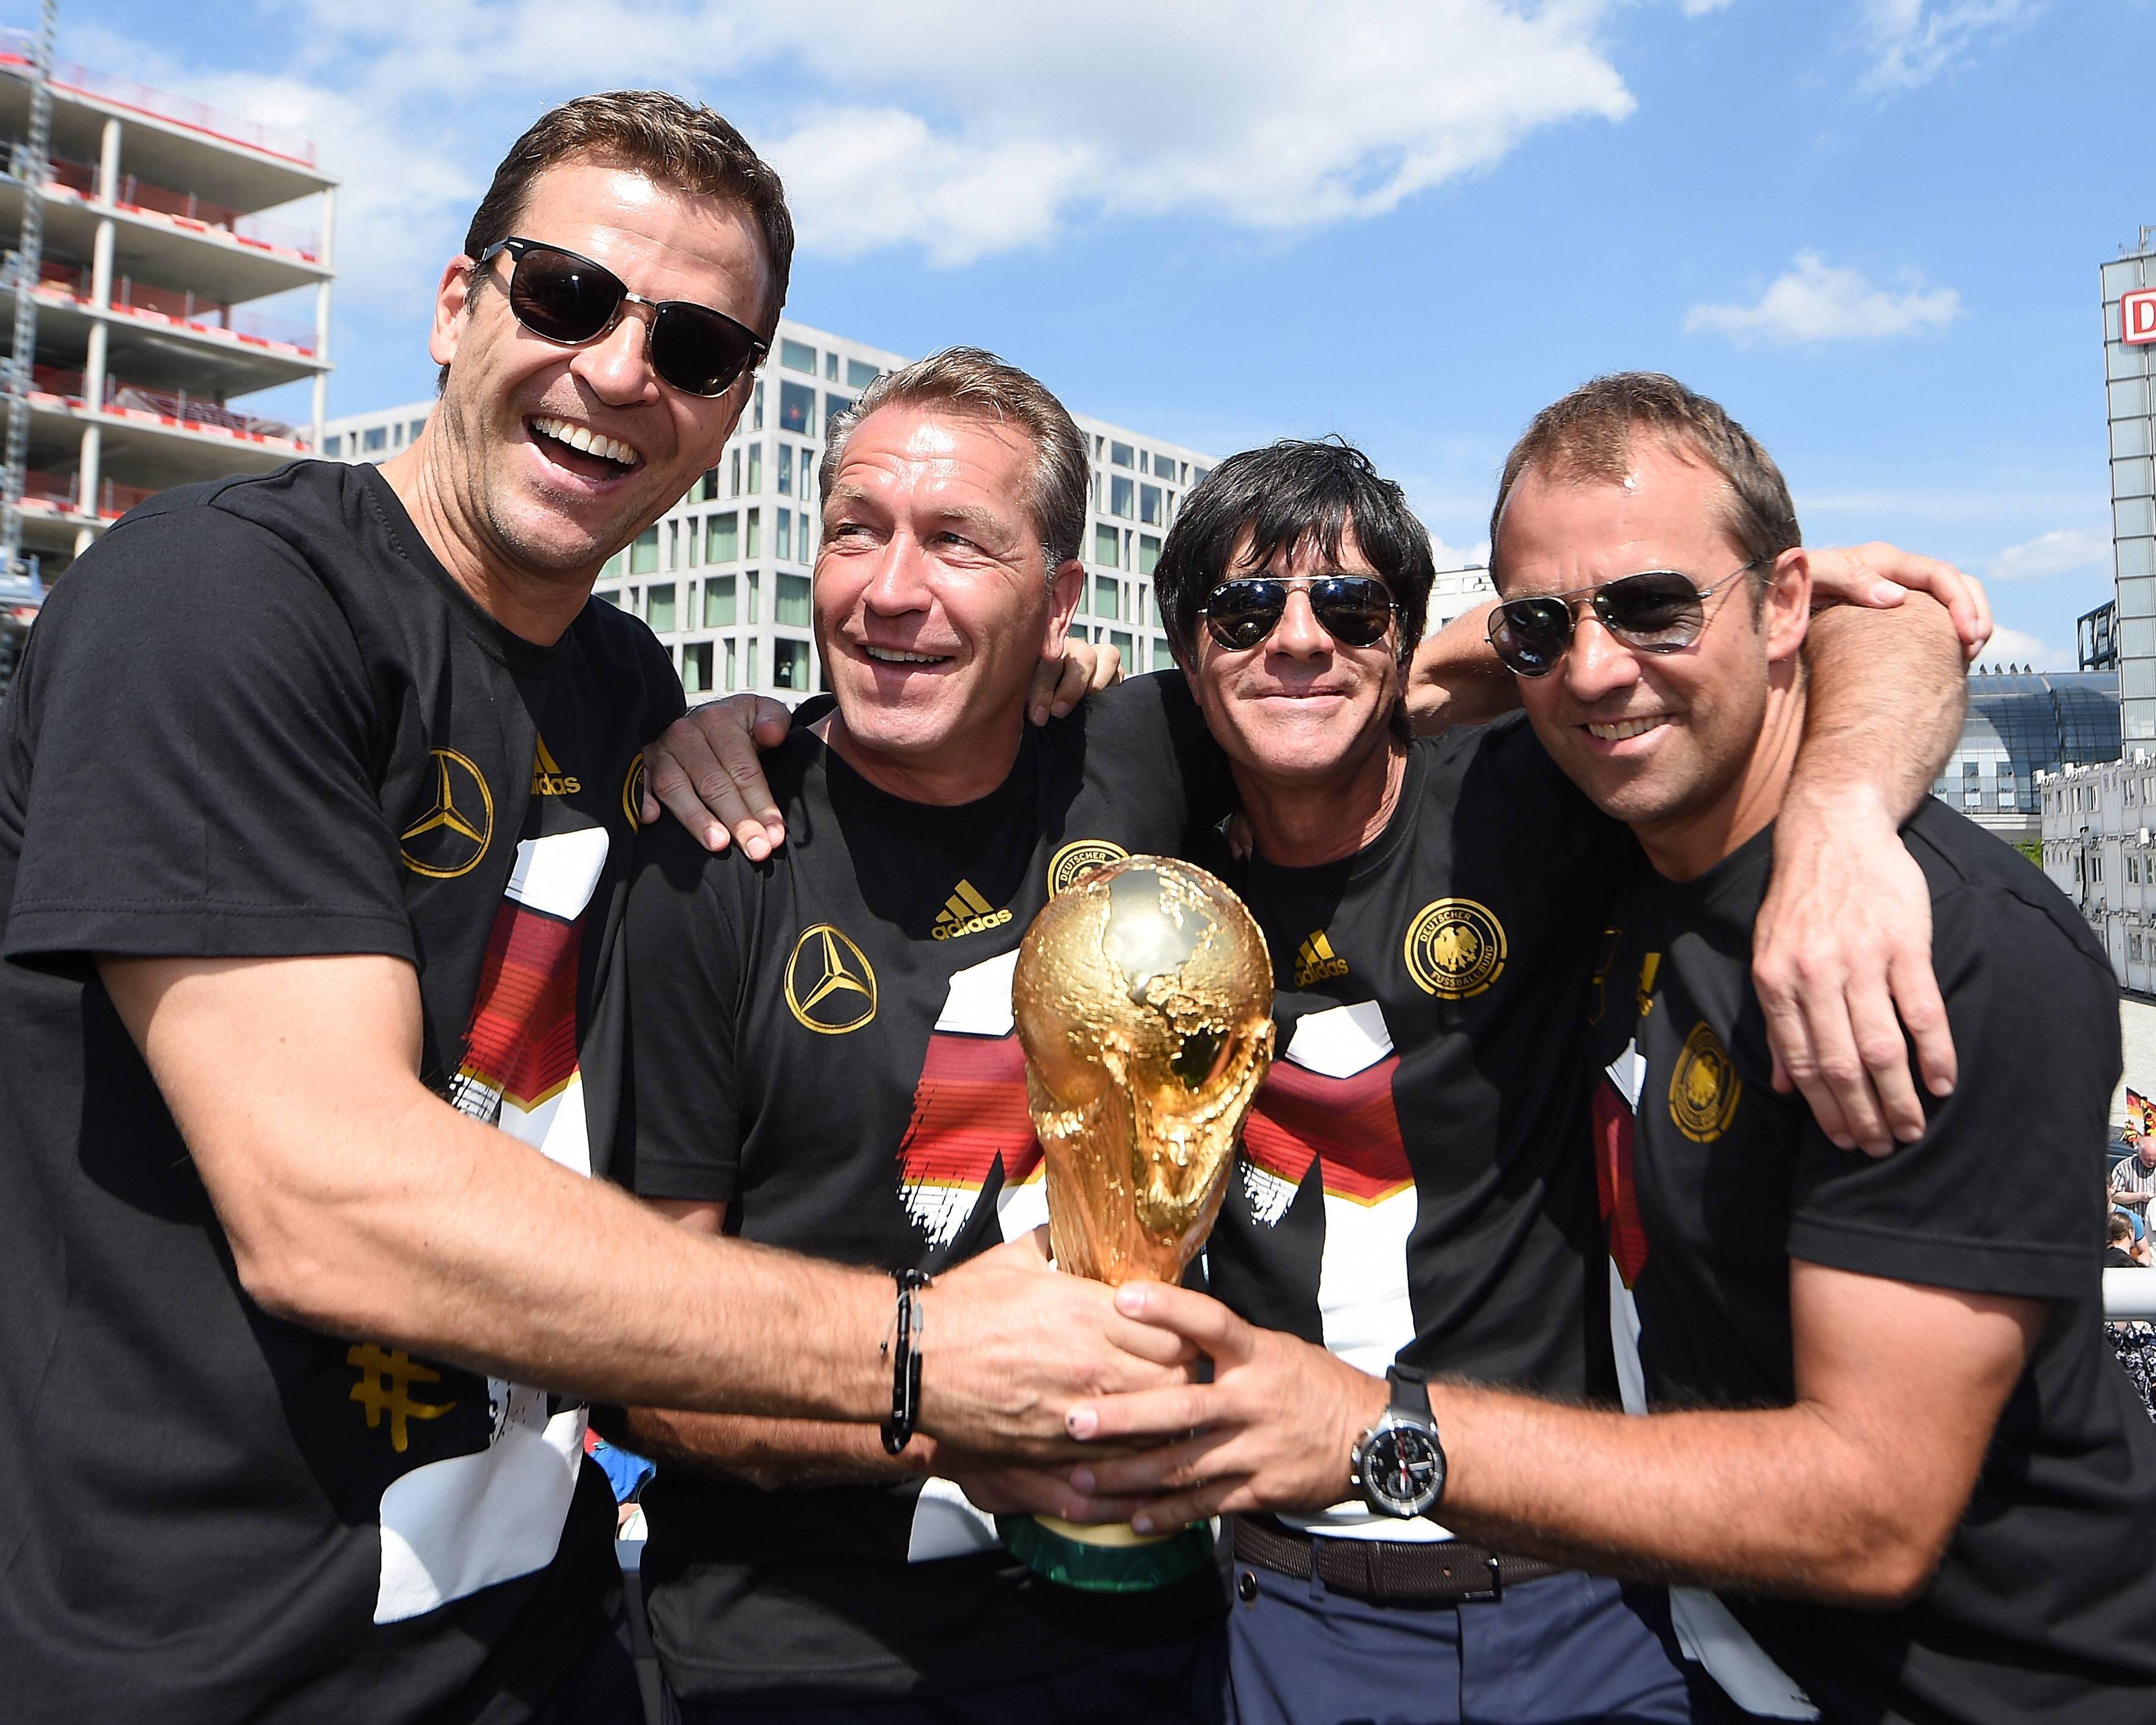 Bundesliga | Hansi Flick: 5 things on Bayern Munich's new coach